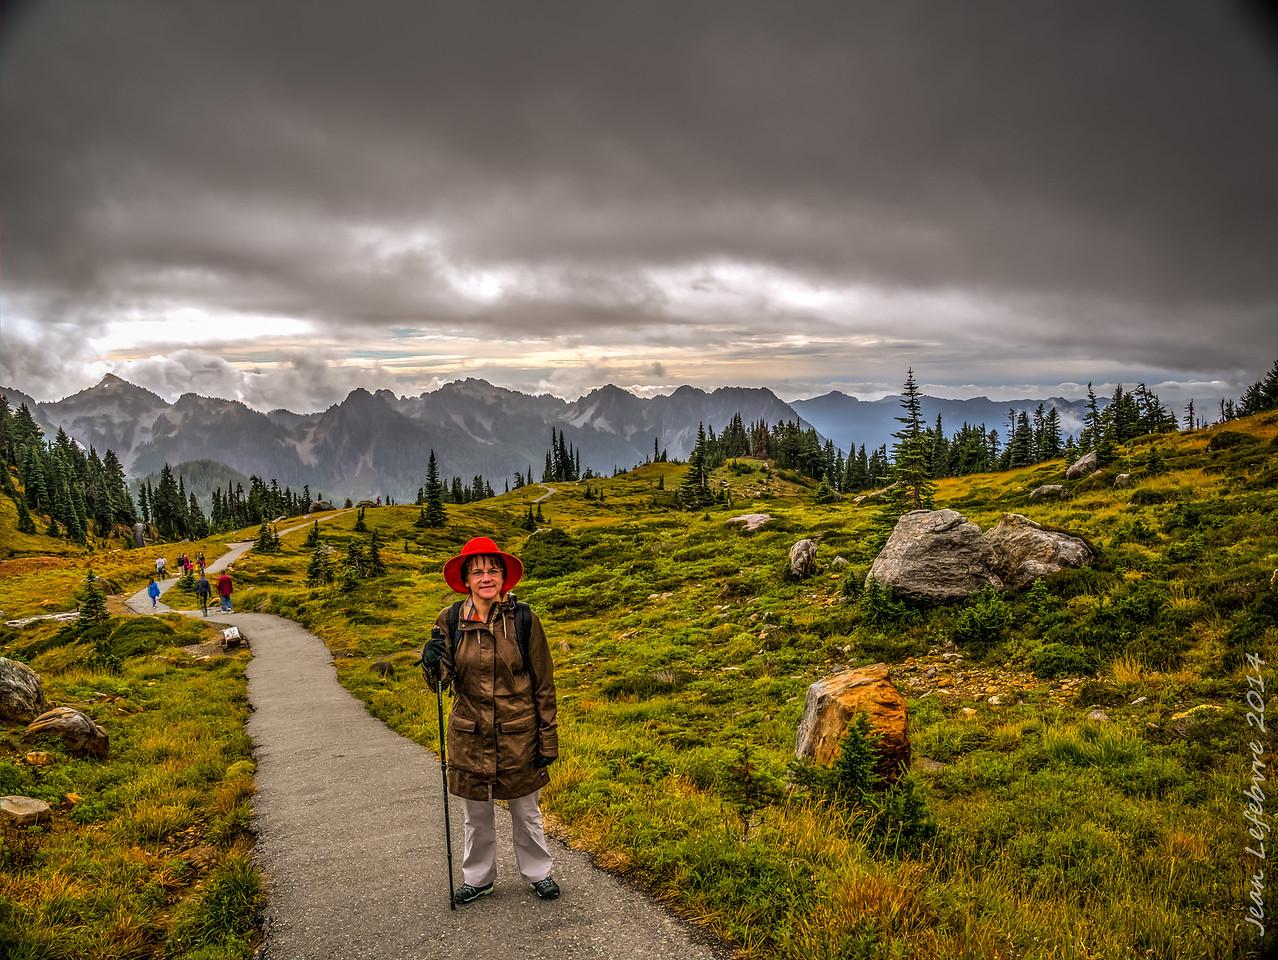 Mount_Rainier_362of15-141012-243_HDR